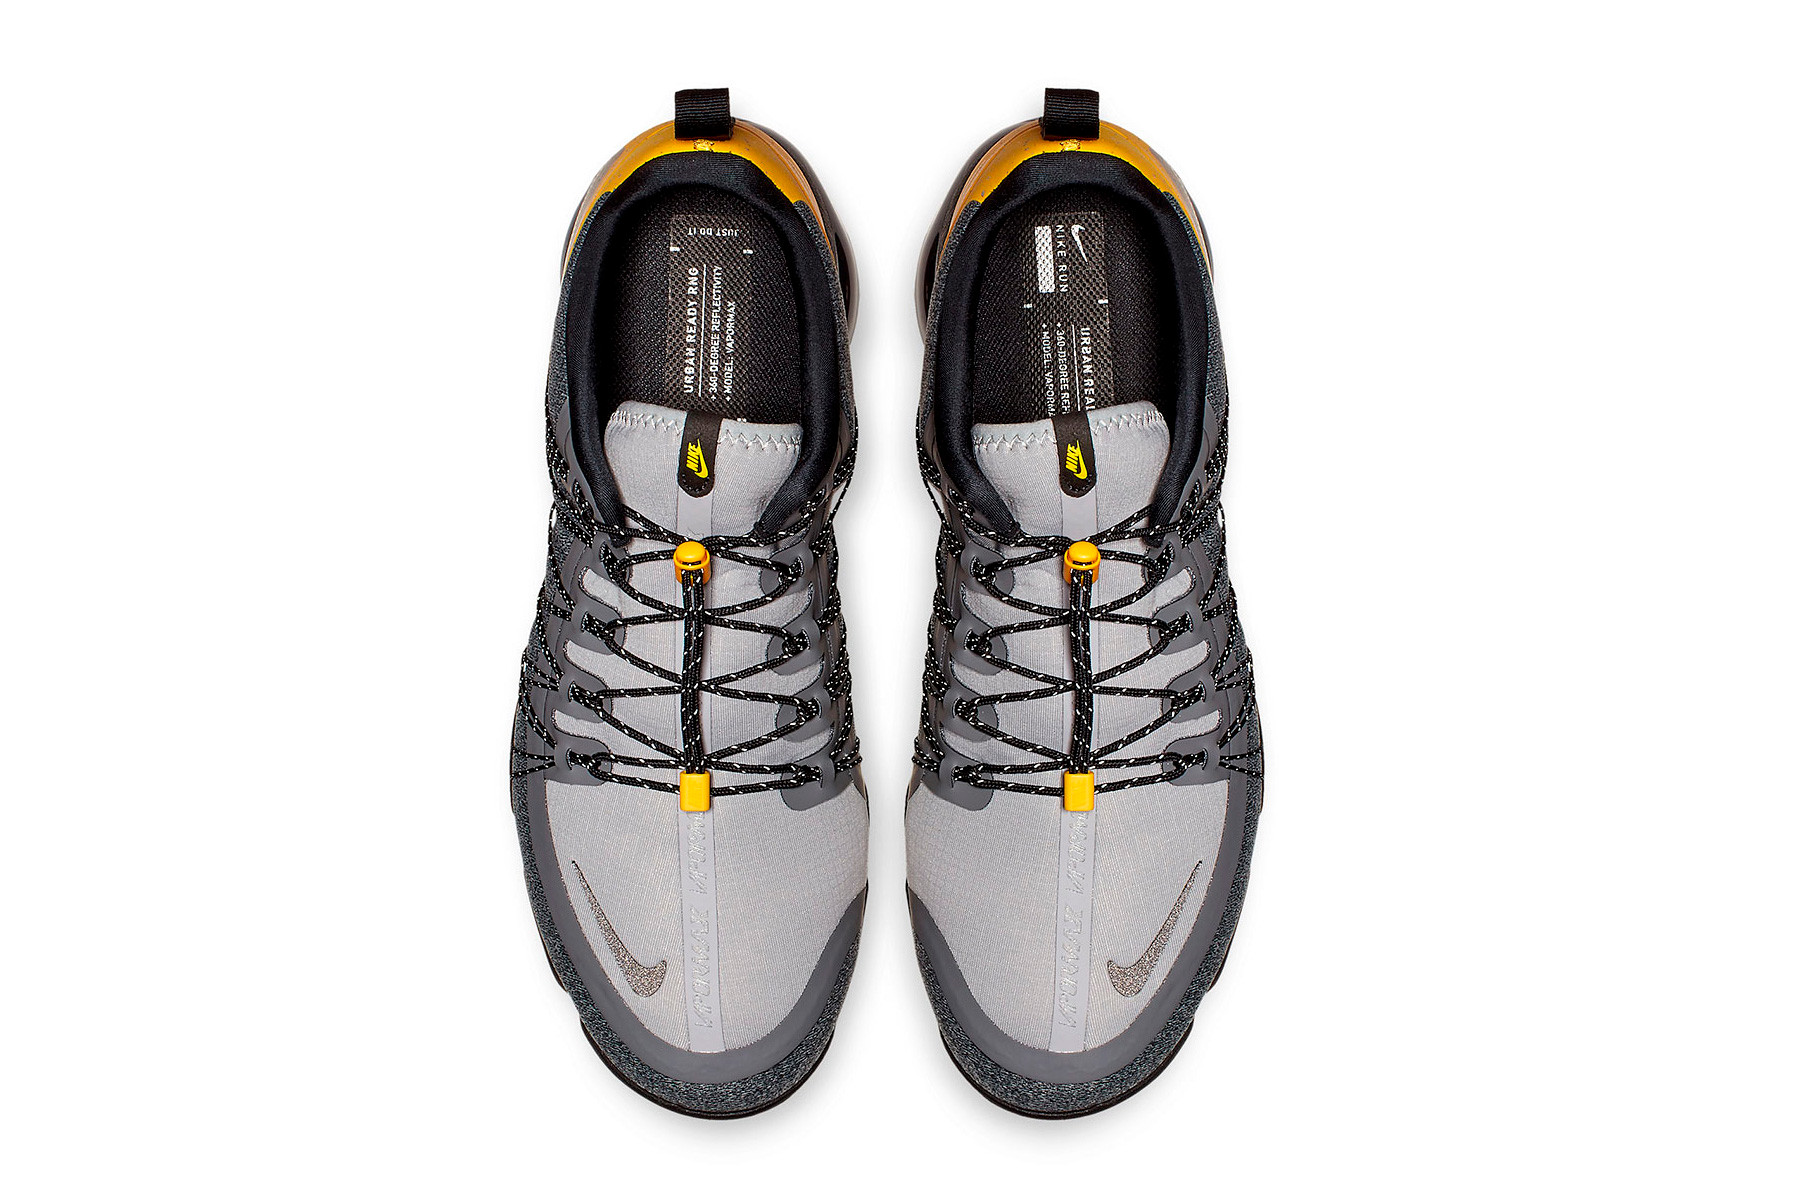 Nike Air VaporMax Run Utility Grey And